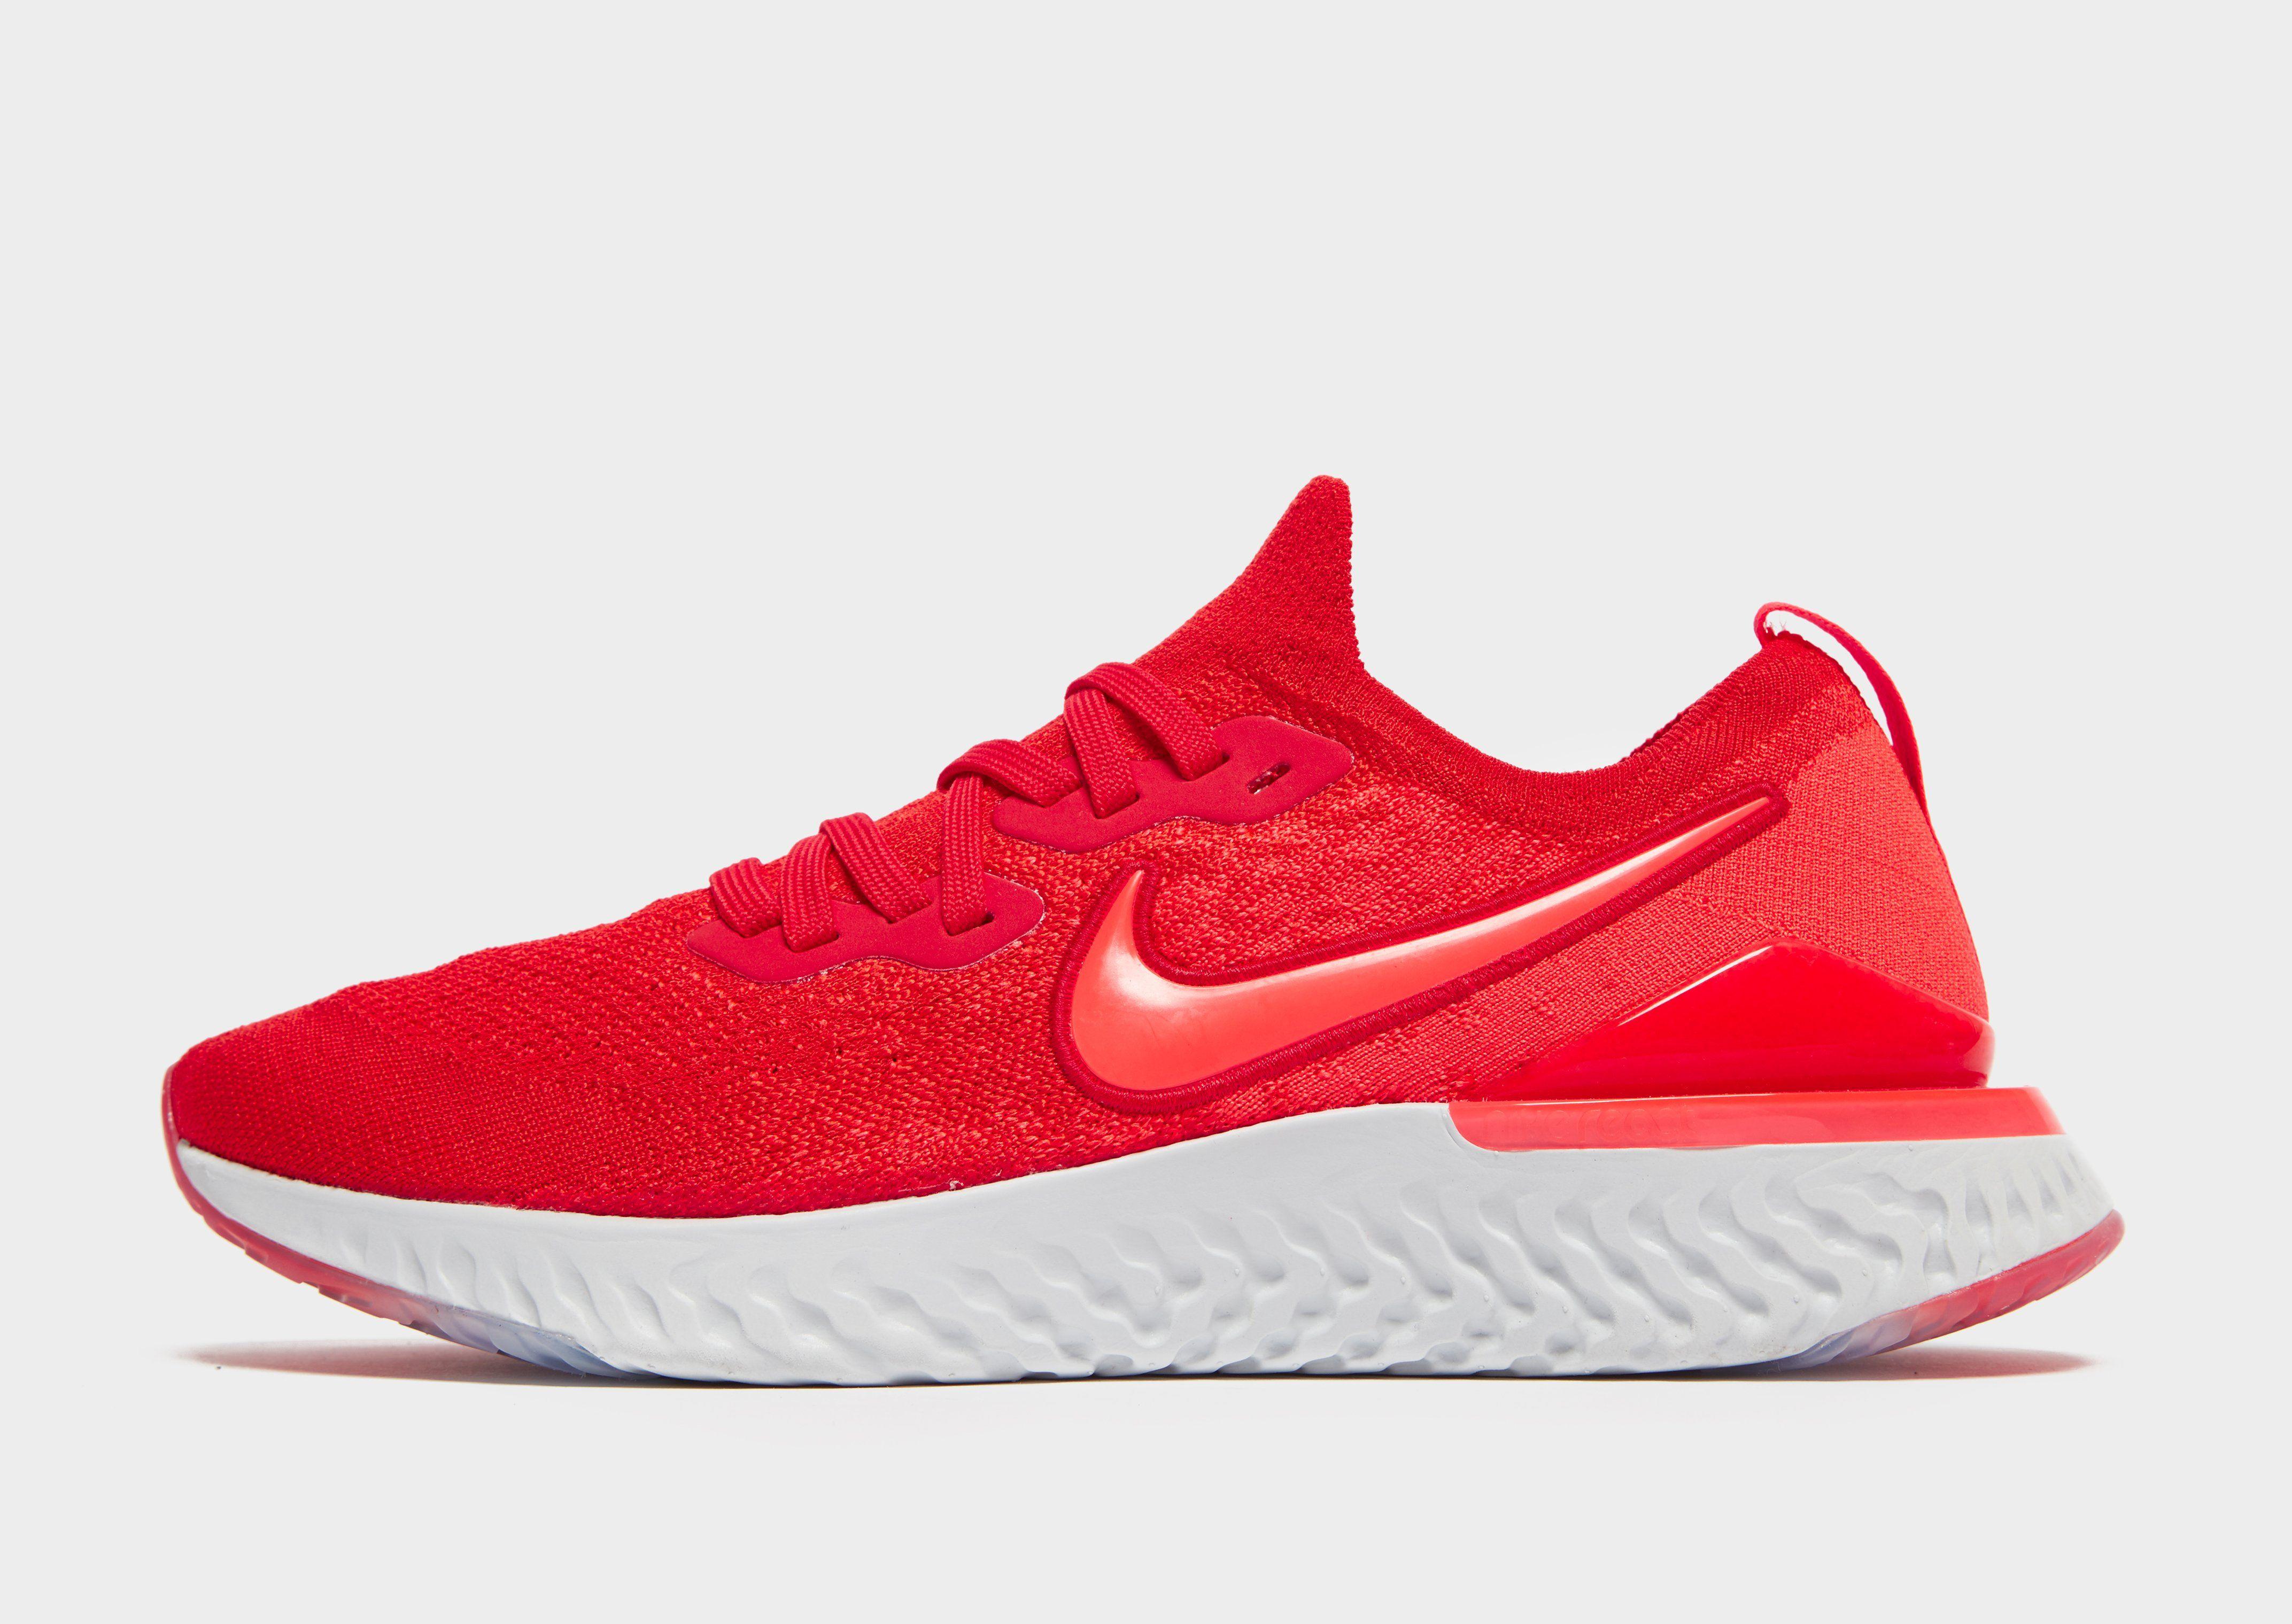 new arrival cdeac cf76a Nike Nike Epic React Flyknit 2 Men's Running Shoe | JD Sports